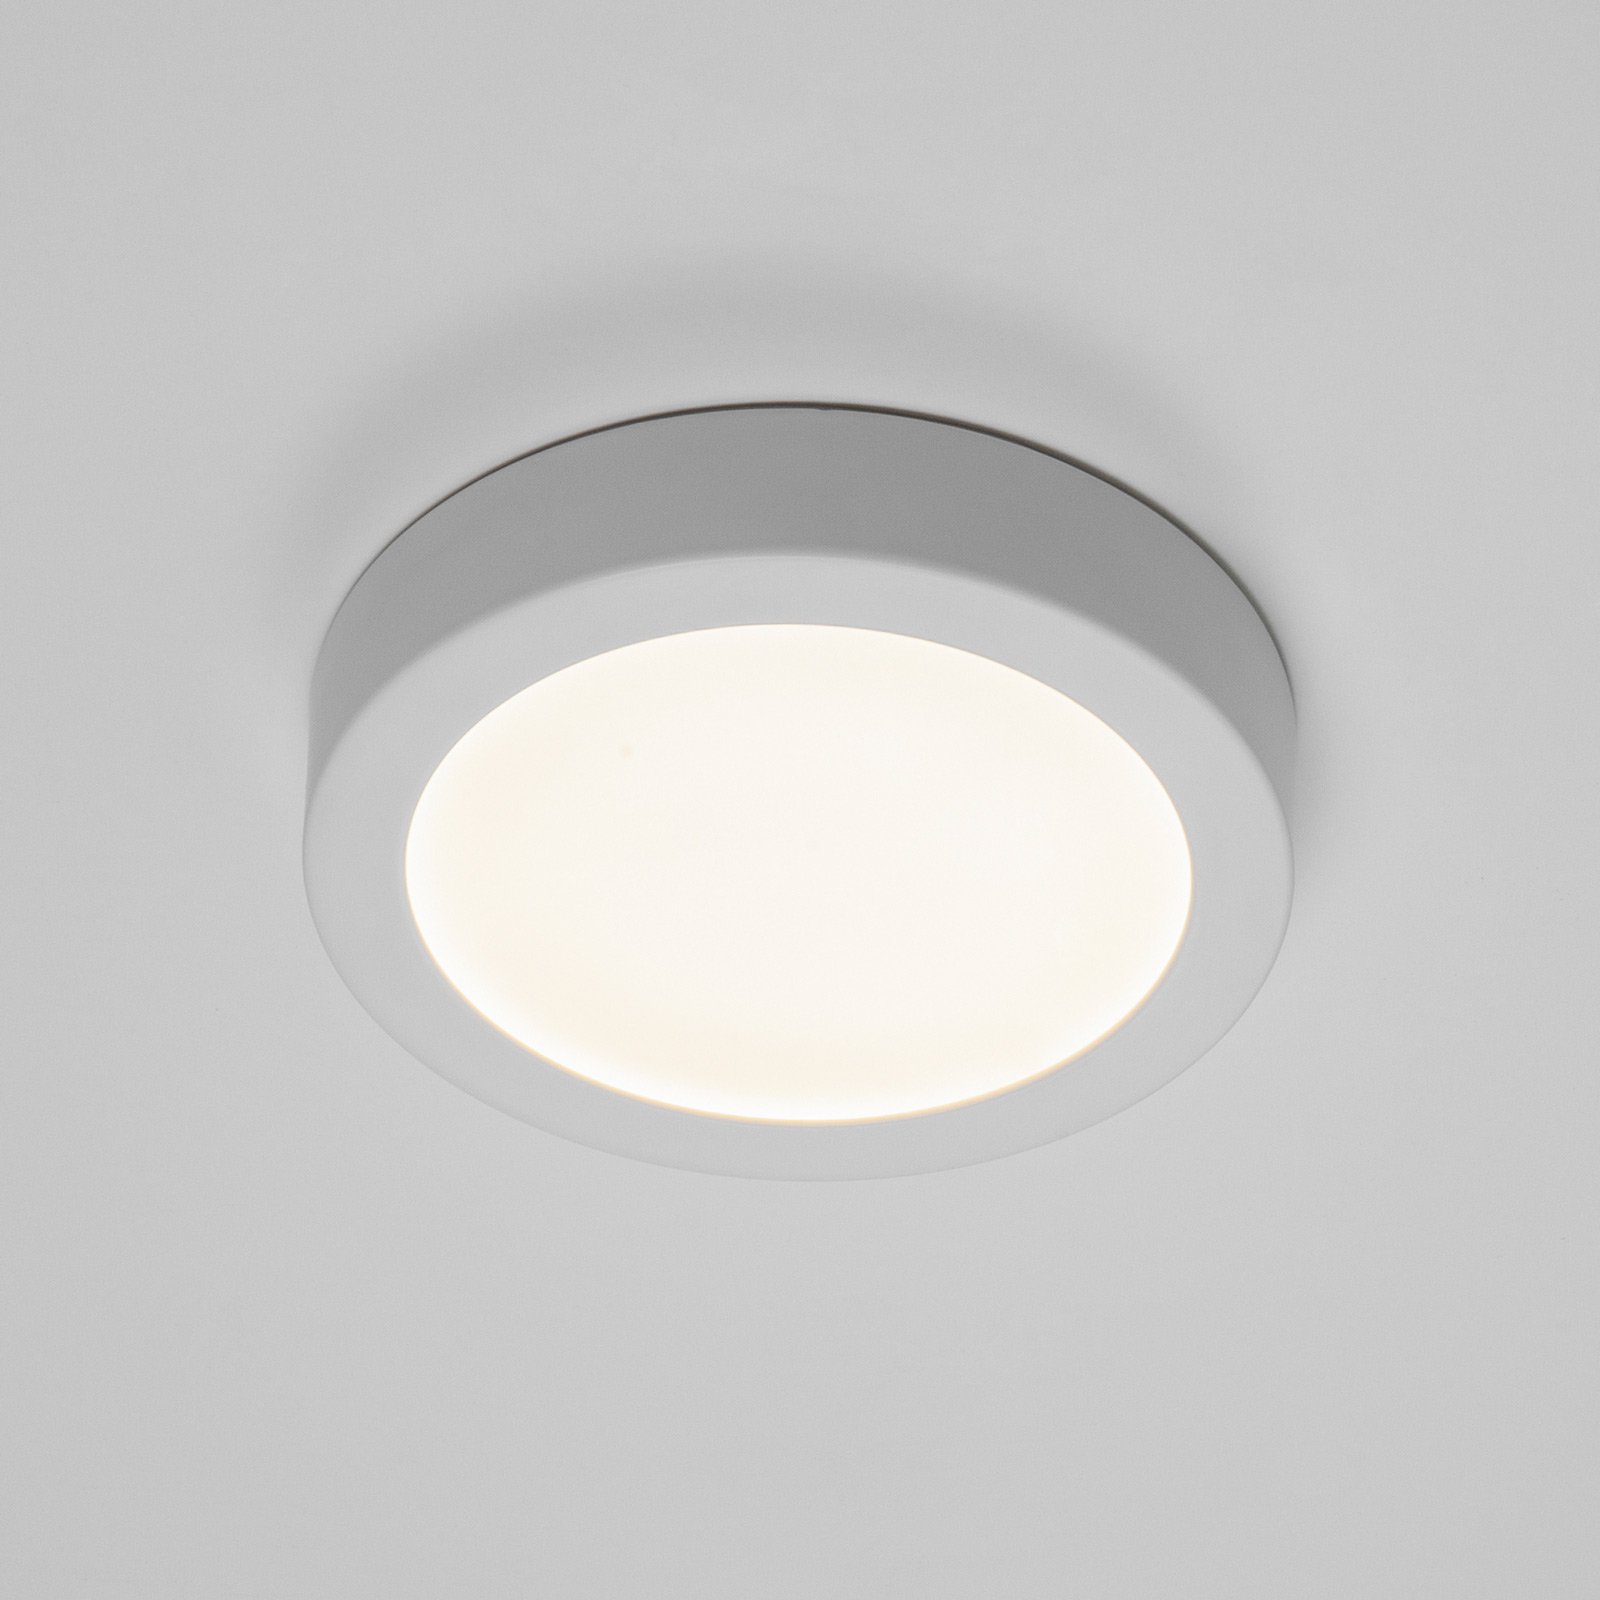 BRUMBERG Flat37 LED-Deckenpanel, rund, Ø 18 cm